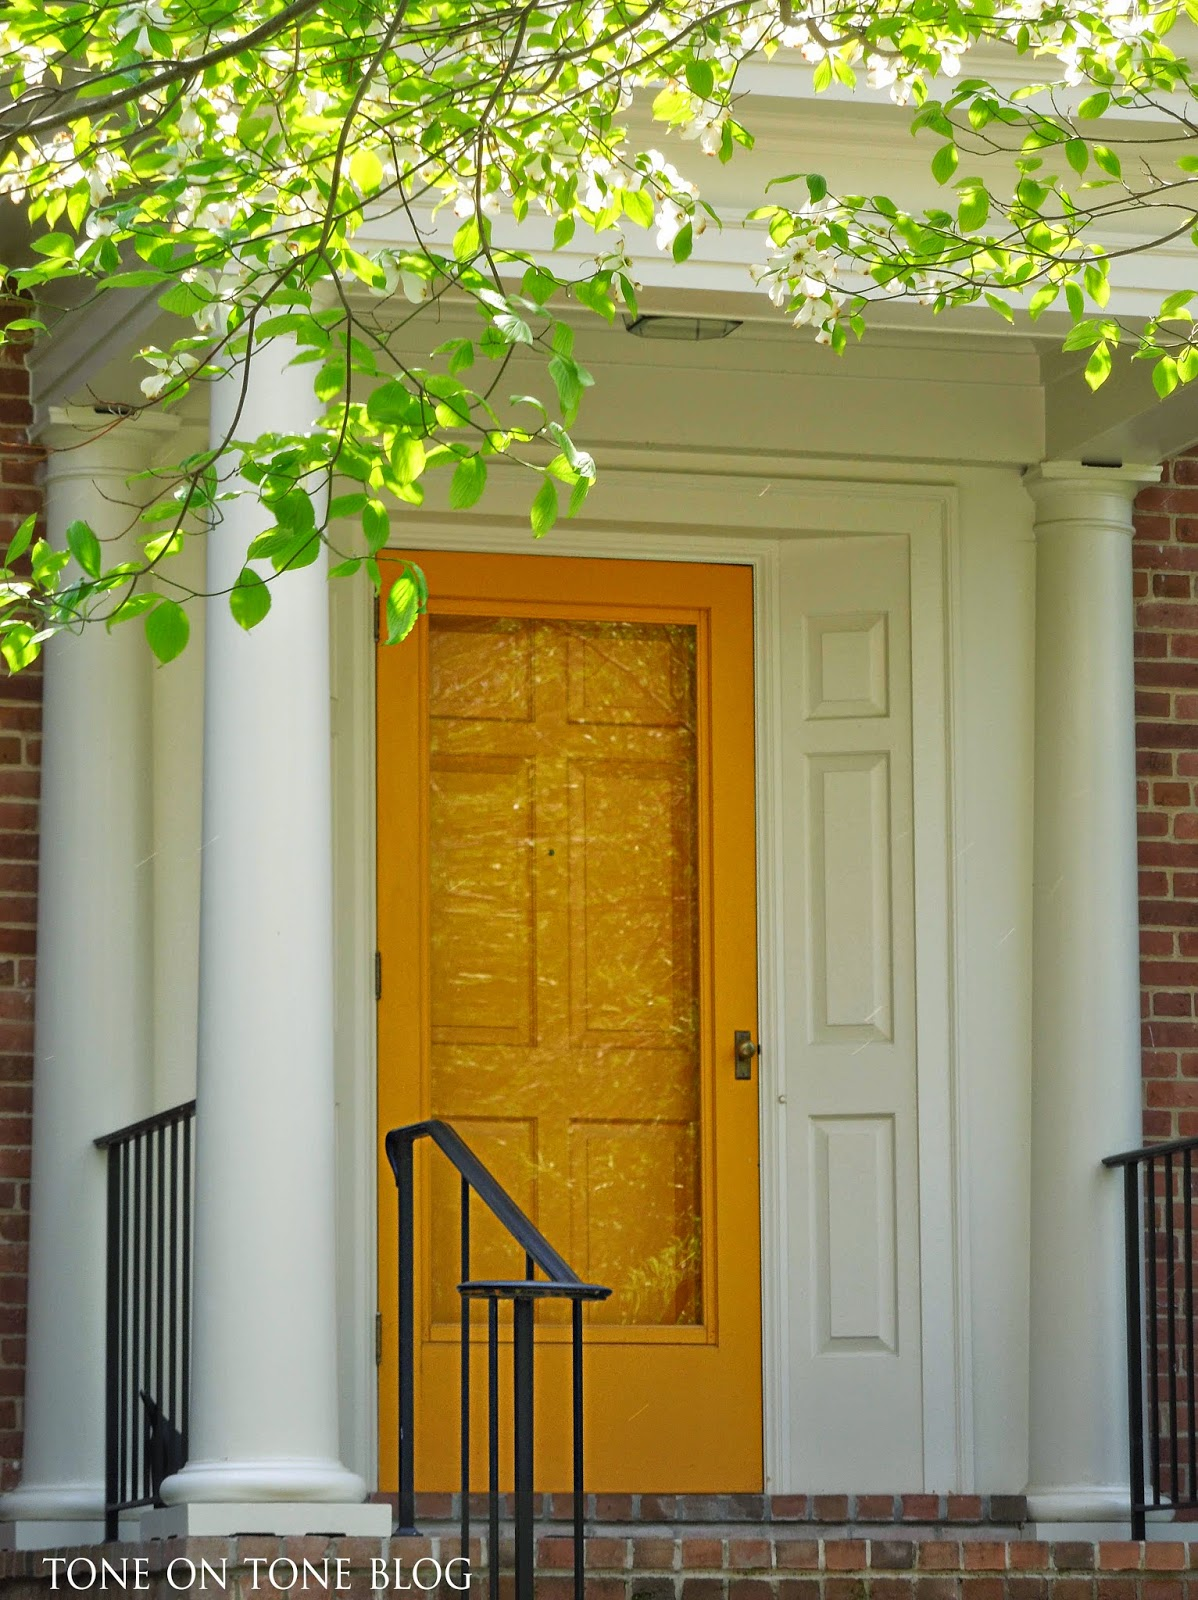 Tone On Tone Interior Garden Design Storm Doors Ideas And Inspirations